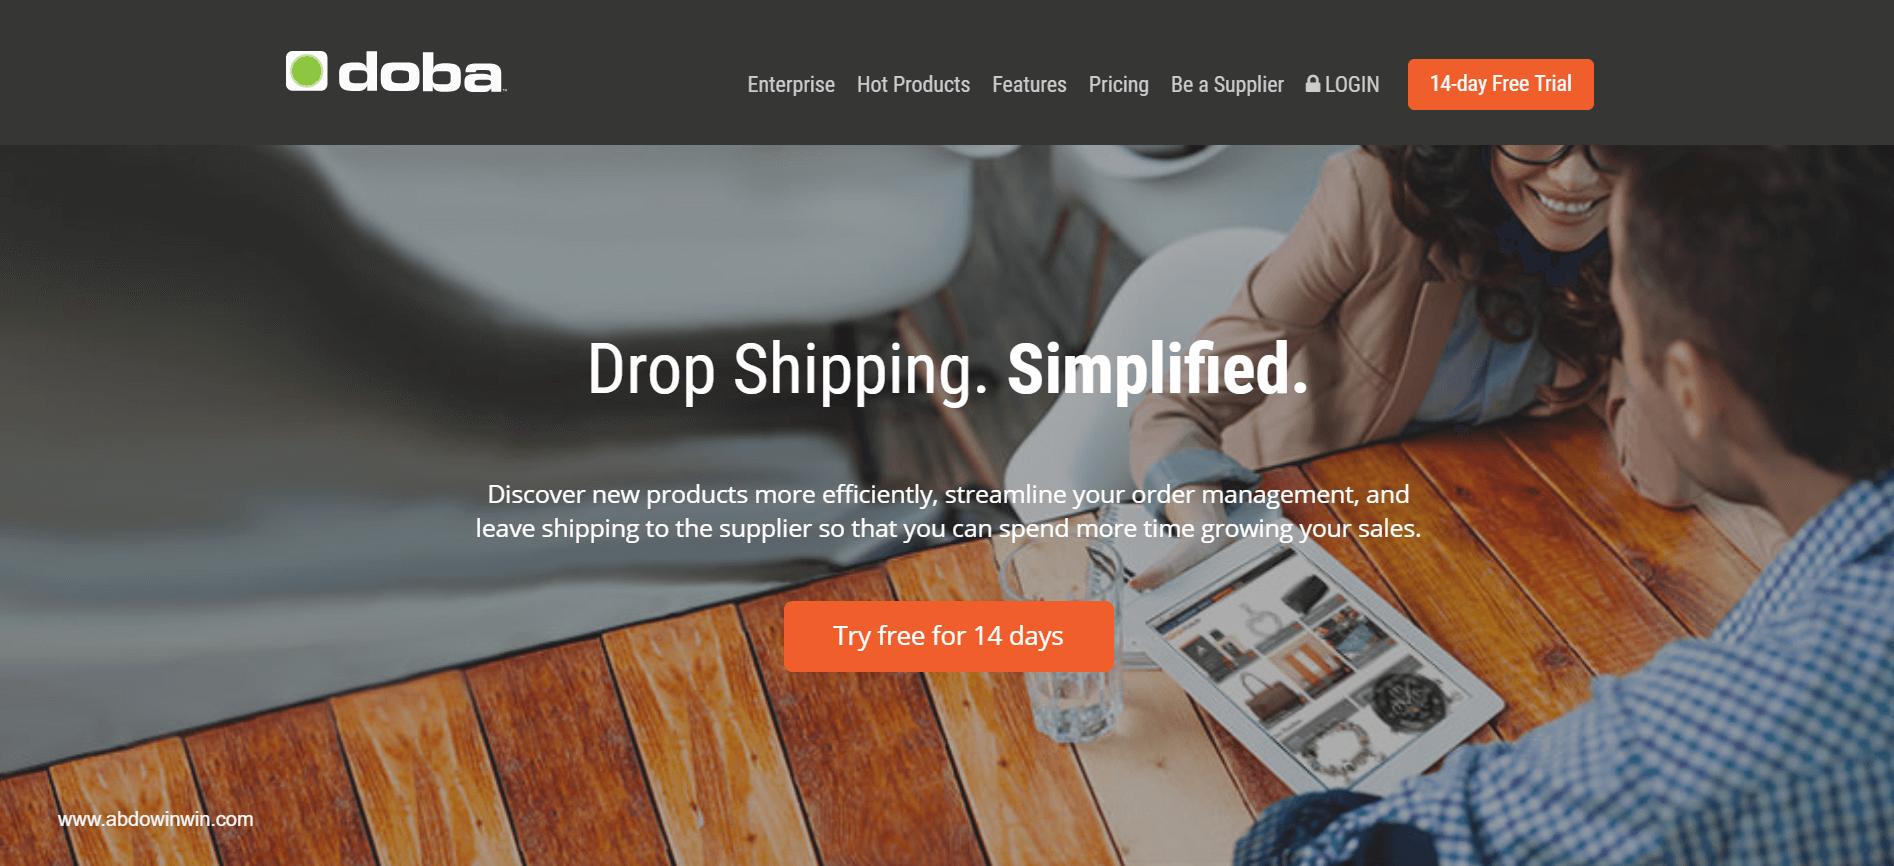 Doba | Dropshipper Service